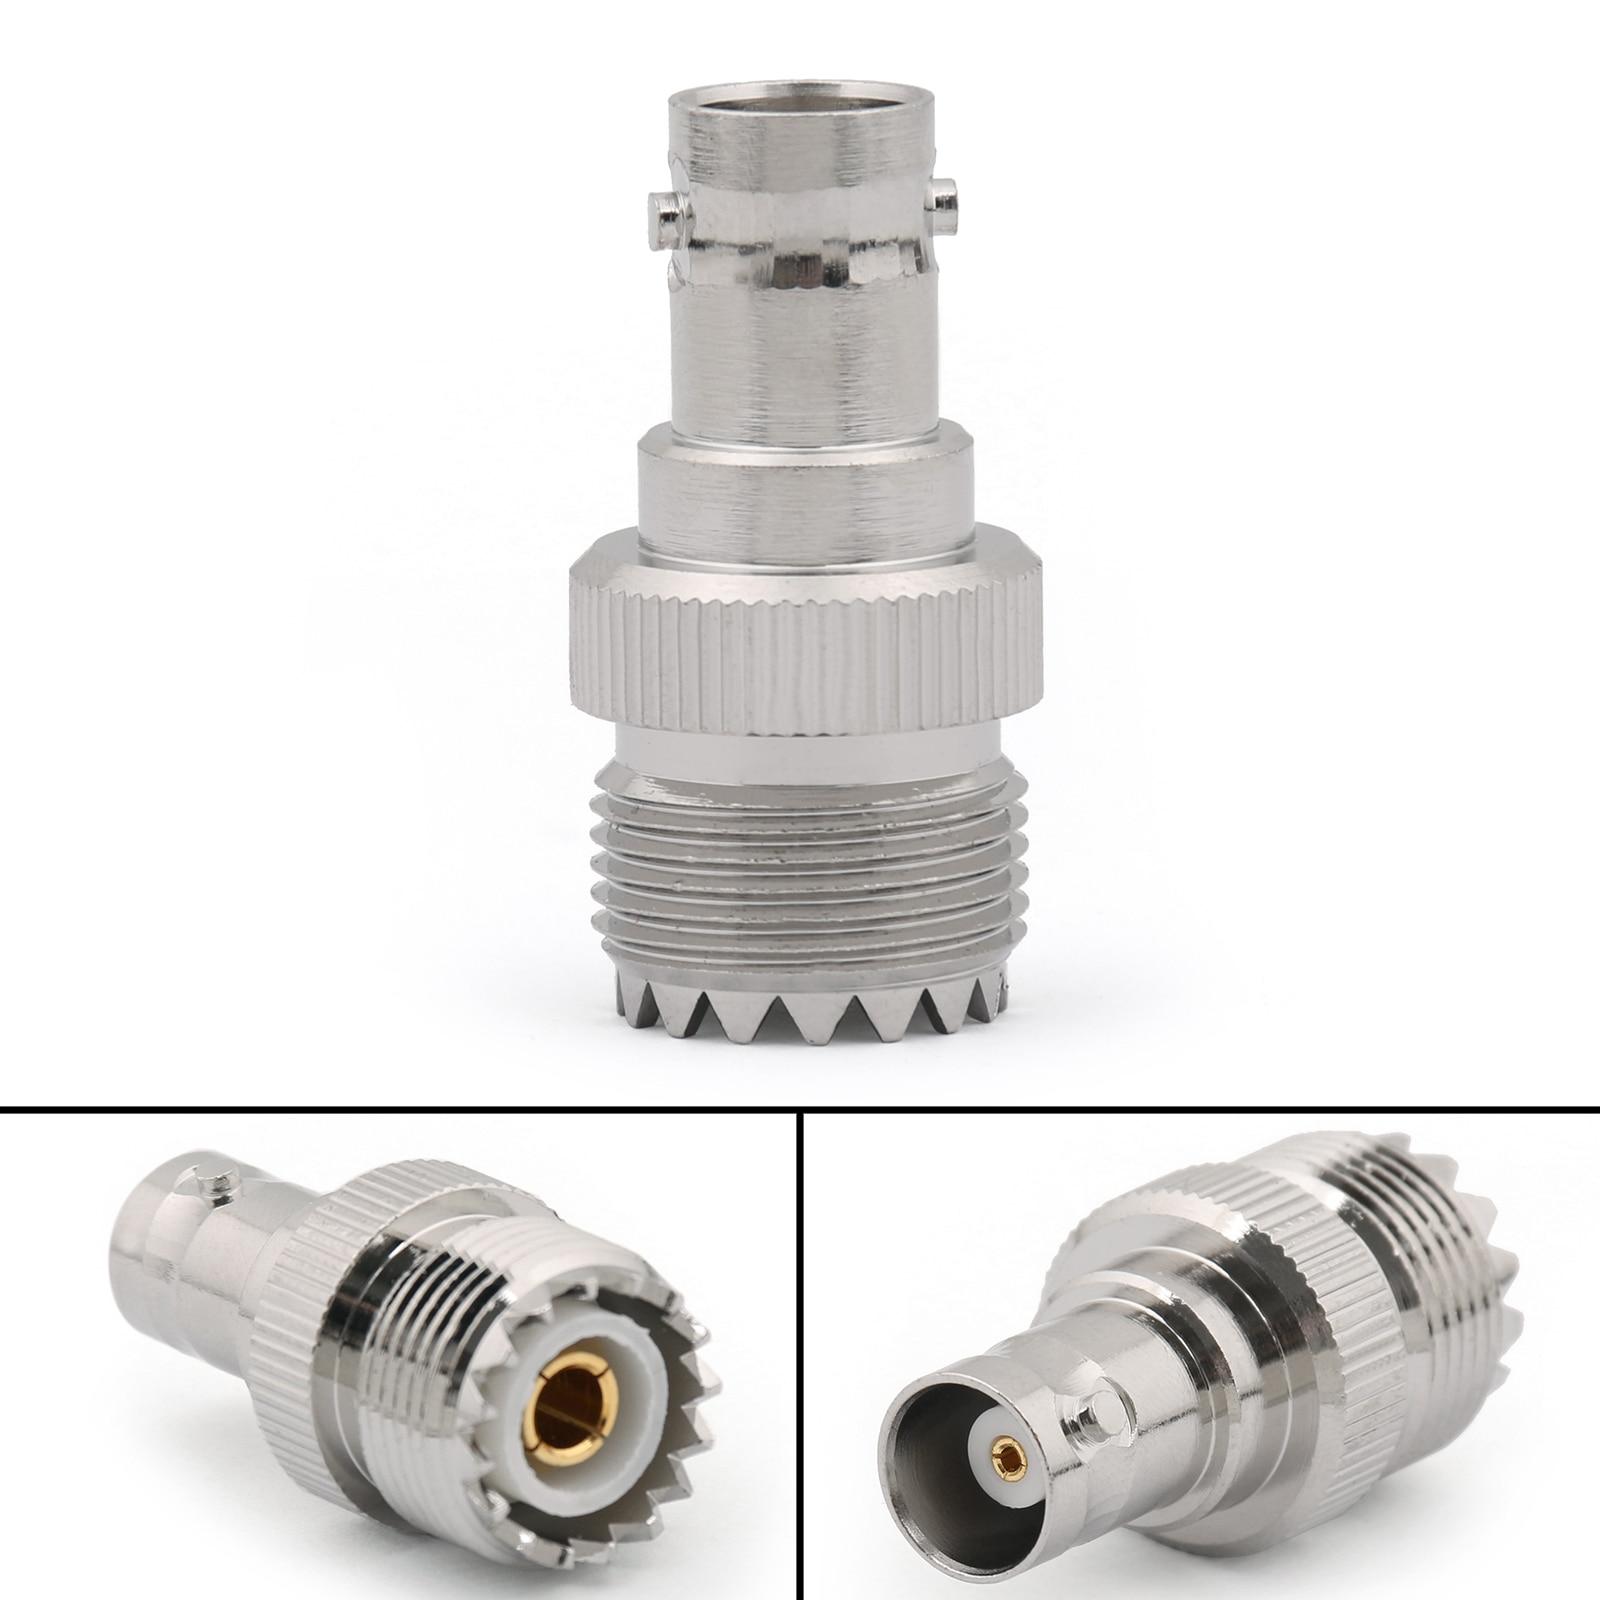 Artudatech 10 قطعة UHF الإناث PL259 جاك إلى BNC أنثى جاك مستقيم RF موصل محول التوصيل أجزاء